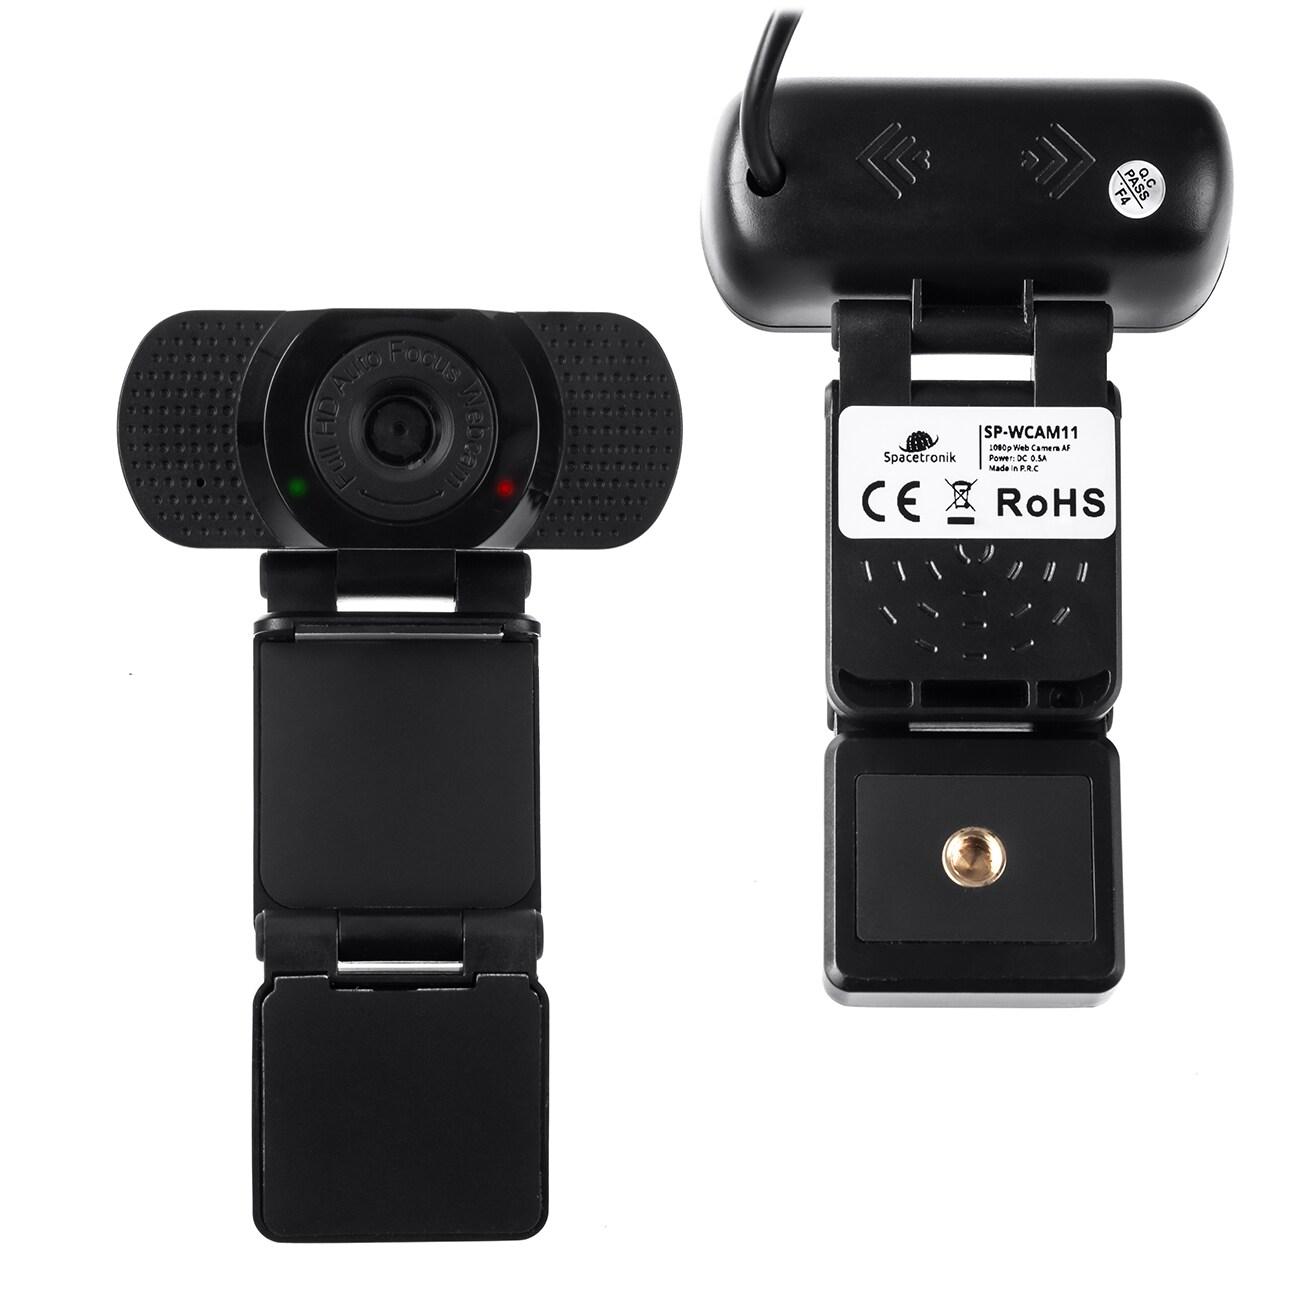 Gaming WebCam For Streaming USB FHD Microphone Camera Auto Focus SP-WCAM11 - 2